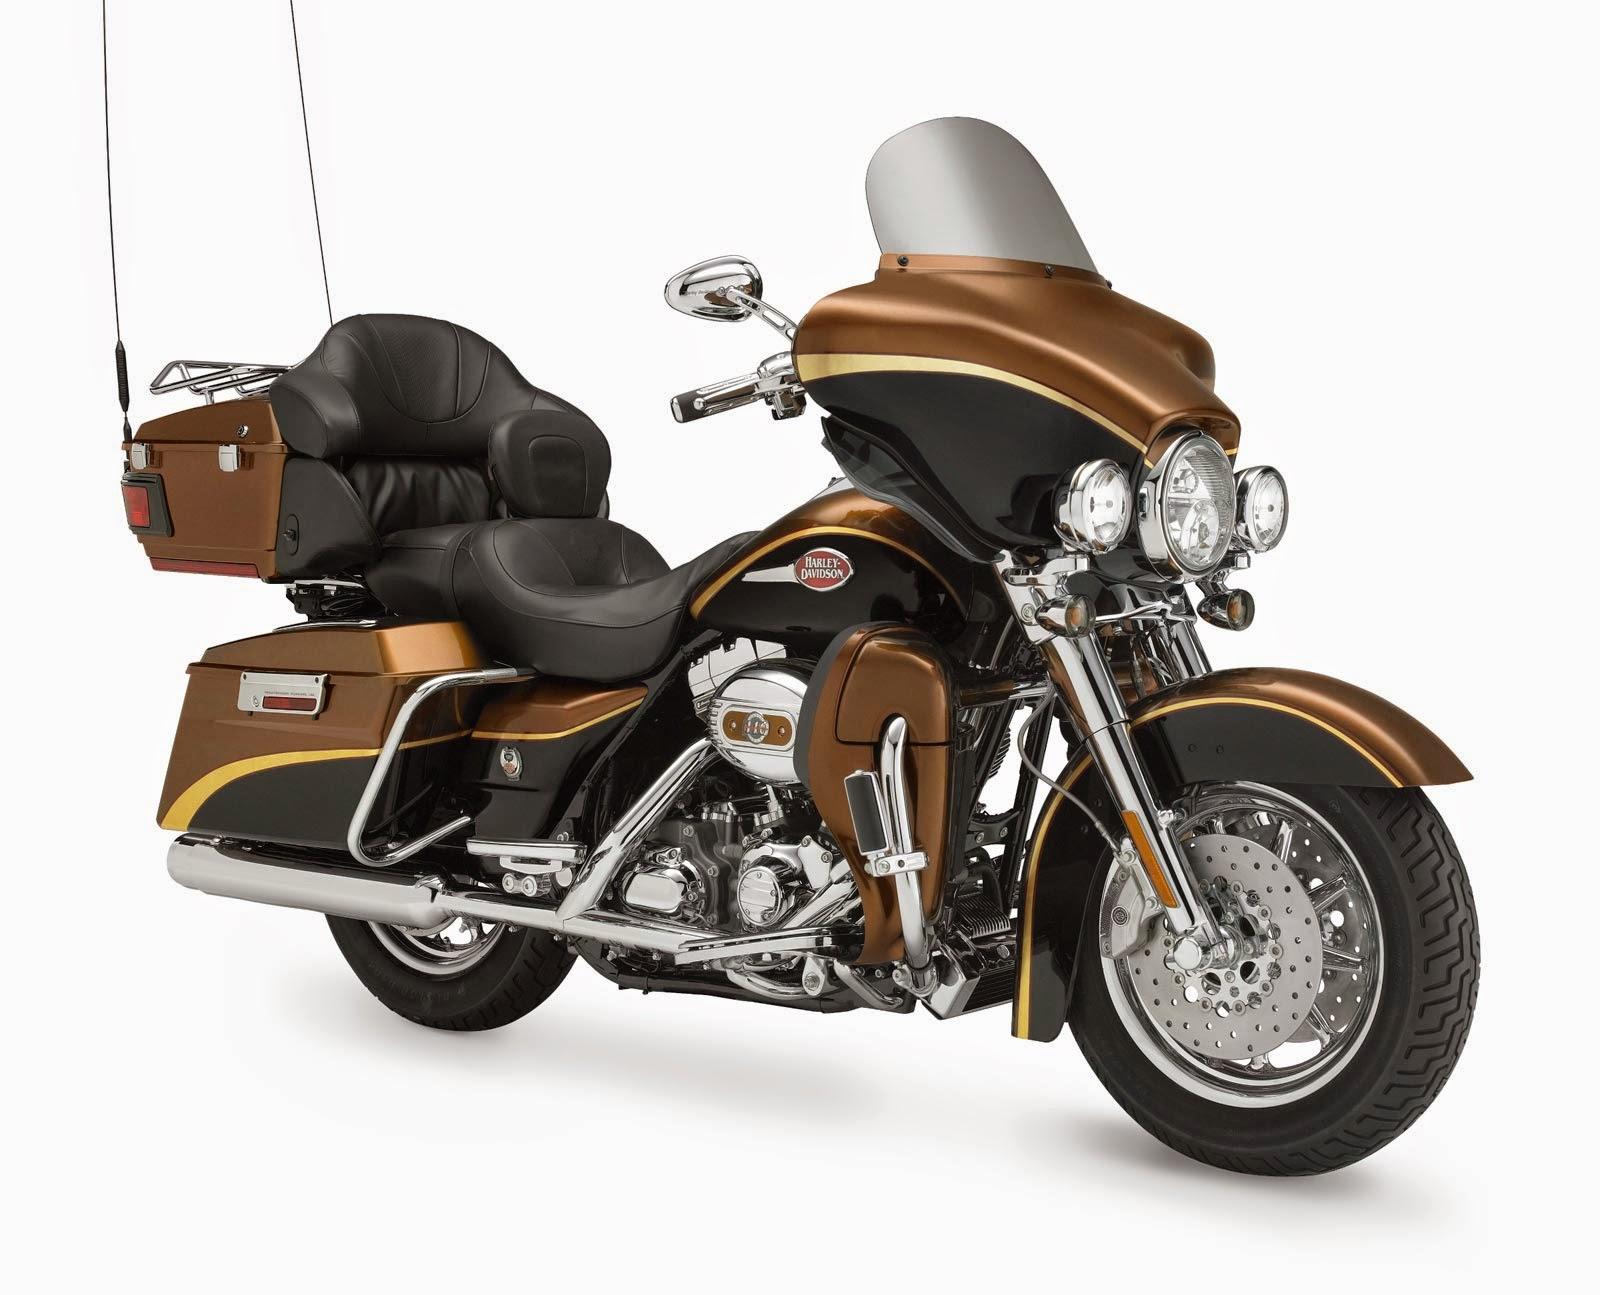 Harley Davidson Cvo Ultra Classic Electra Glide Flhtcuse3 Owner S Manual 2008